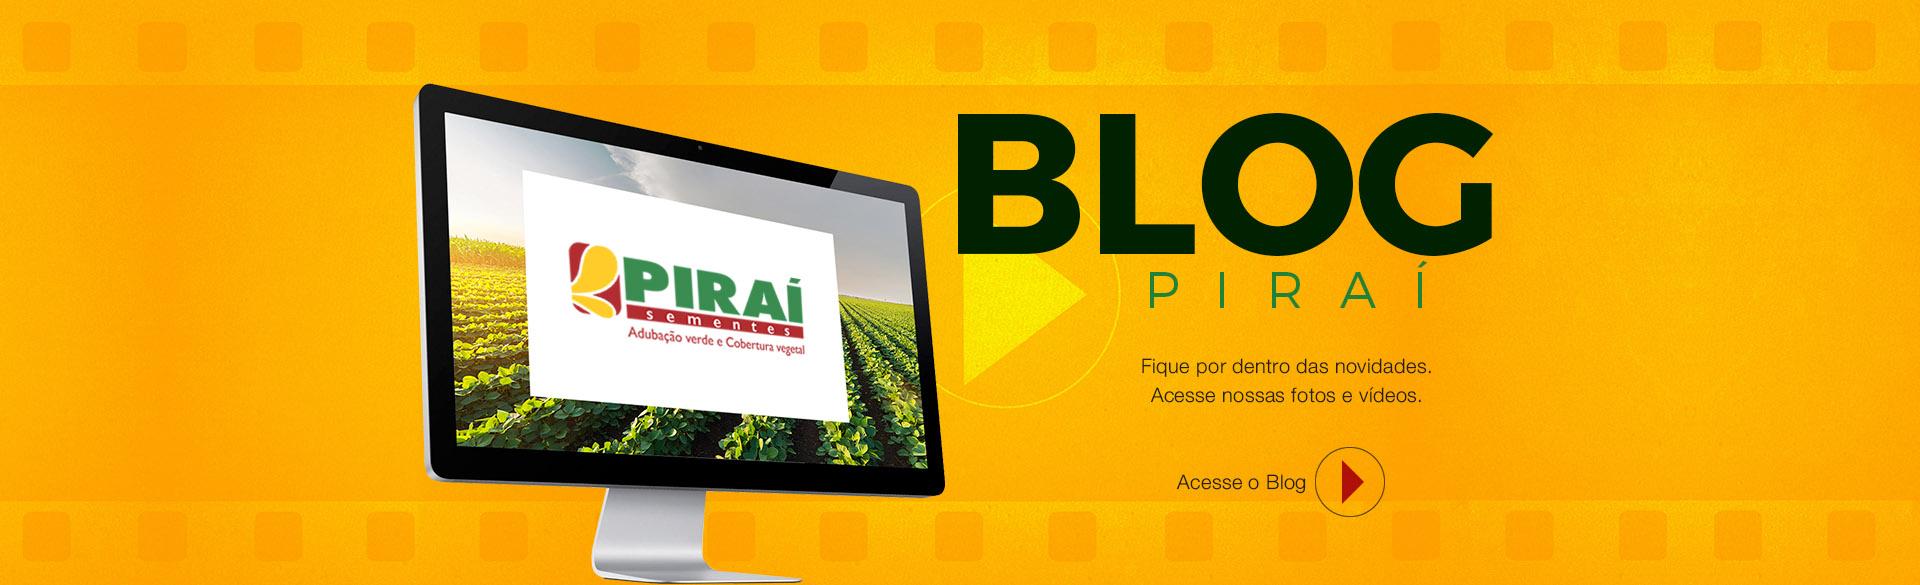 Blog - Fique por dentro das novidades.